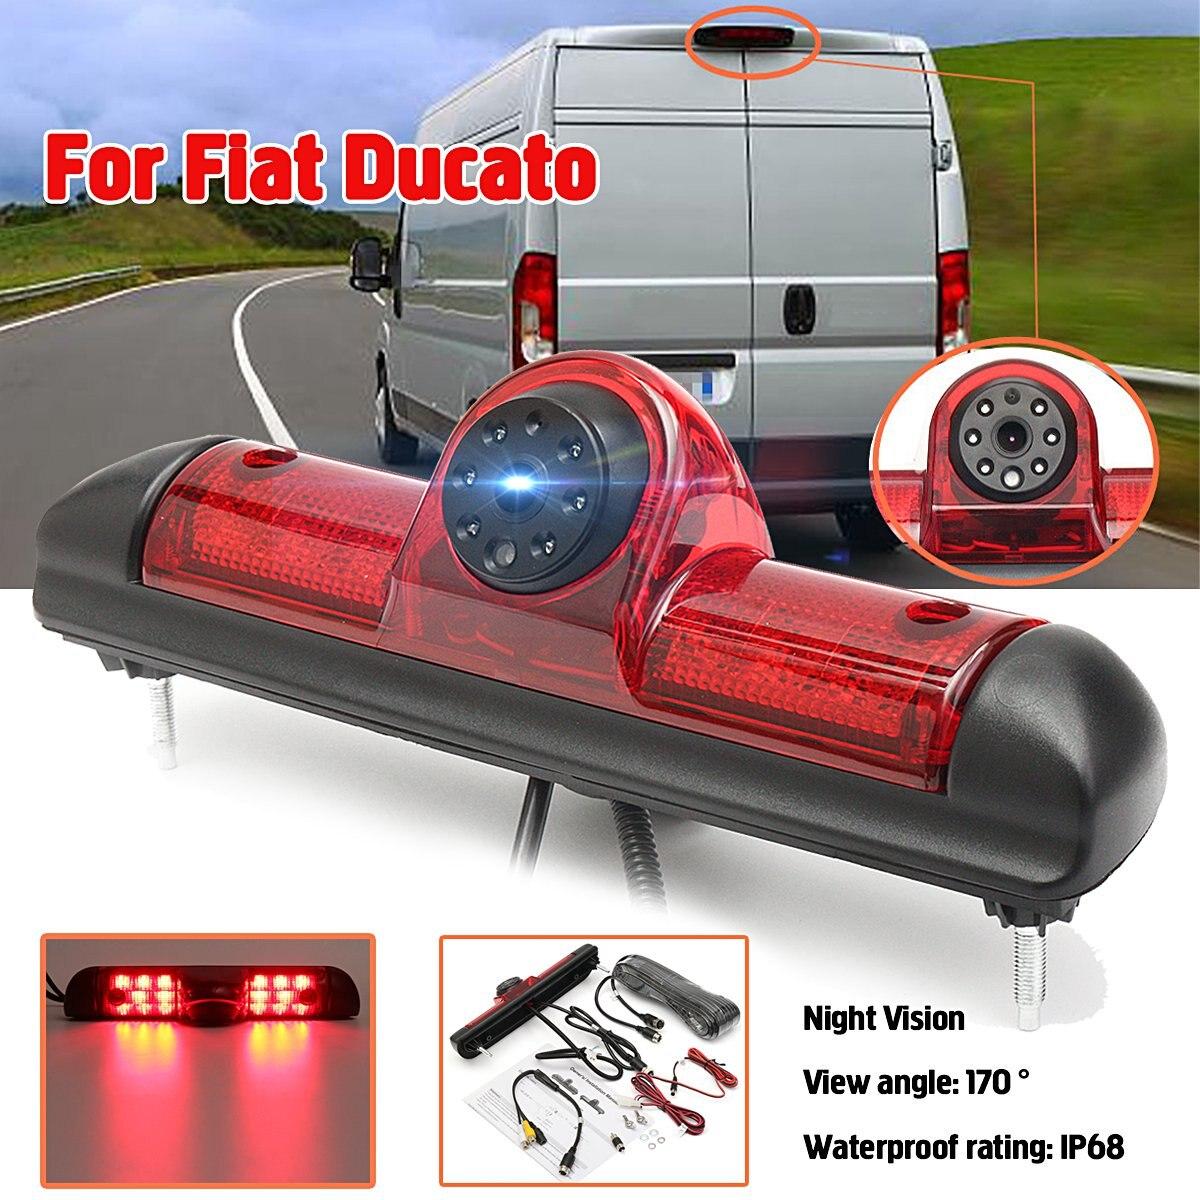 HD CCD камера заднего вида парковочный стоп-сигнал ночного видения для Fiat Ducato late Peugeot Boxer Citroen Jumper